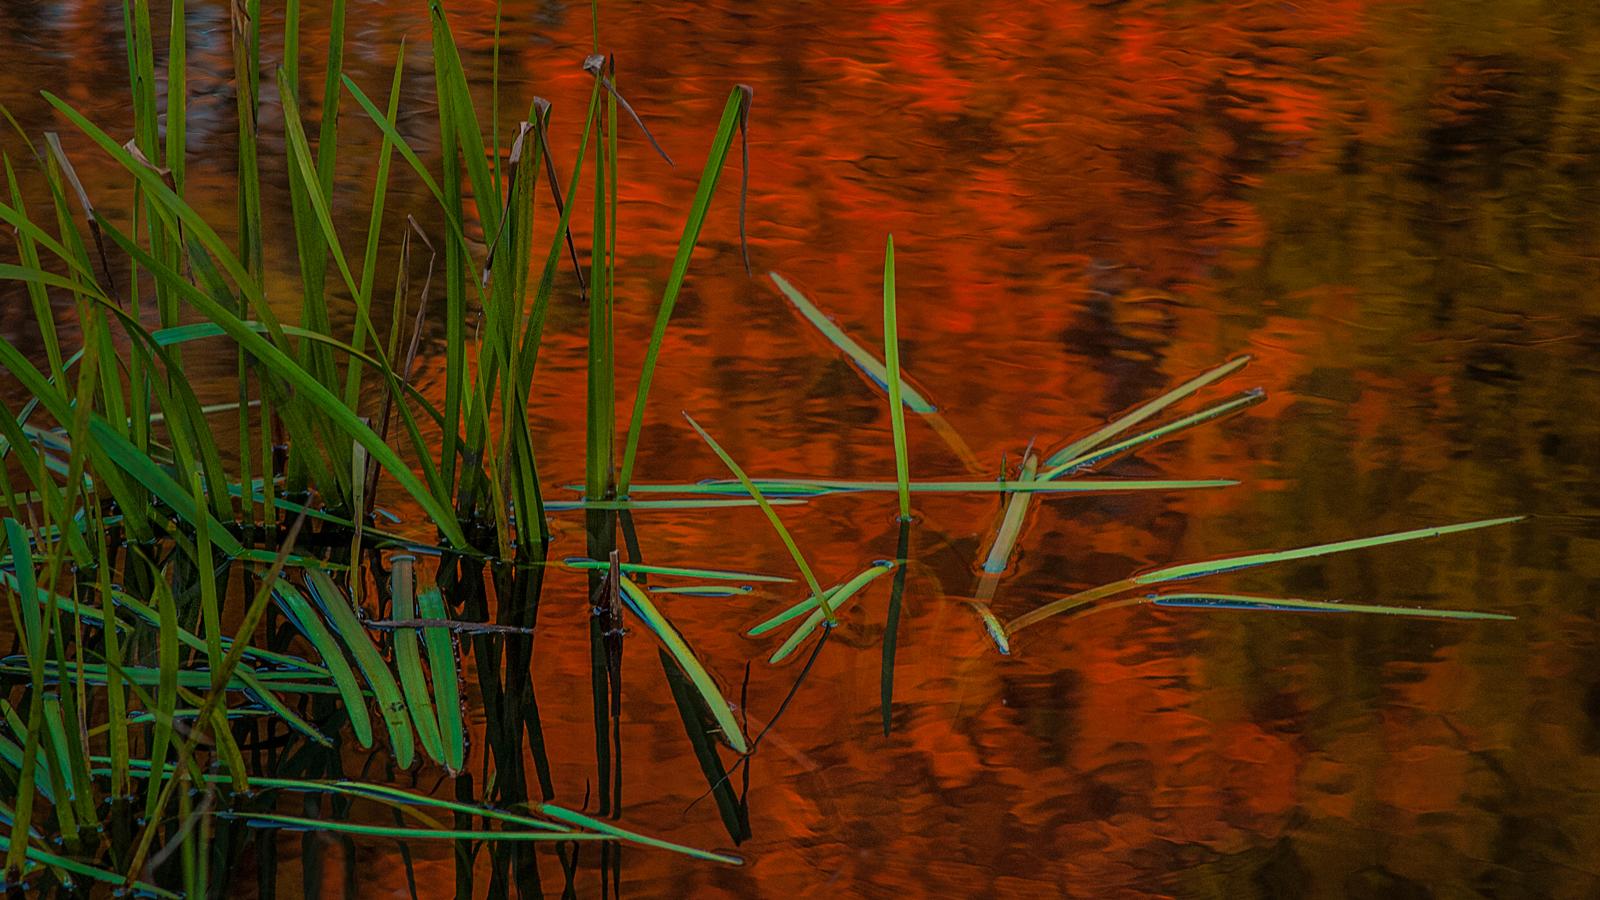 Duke Pottery pond grass